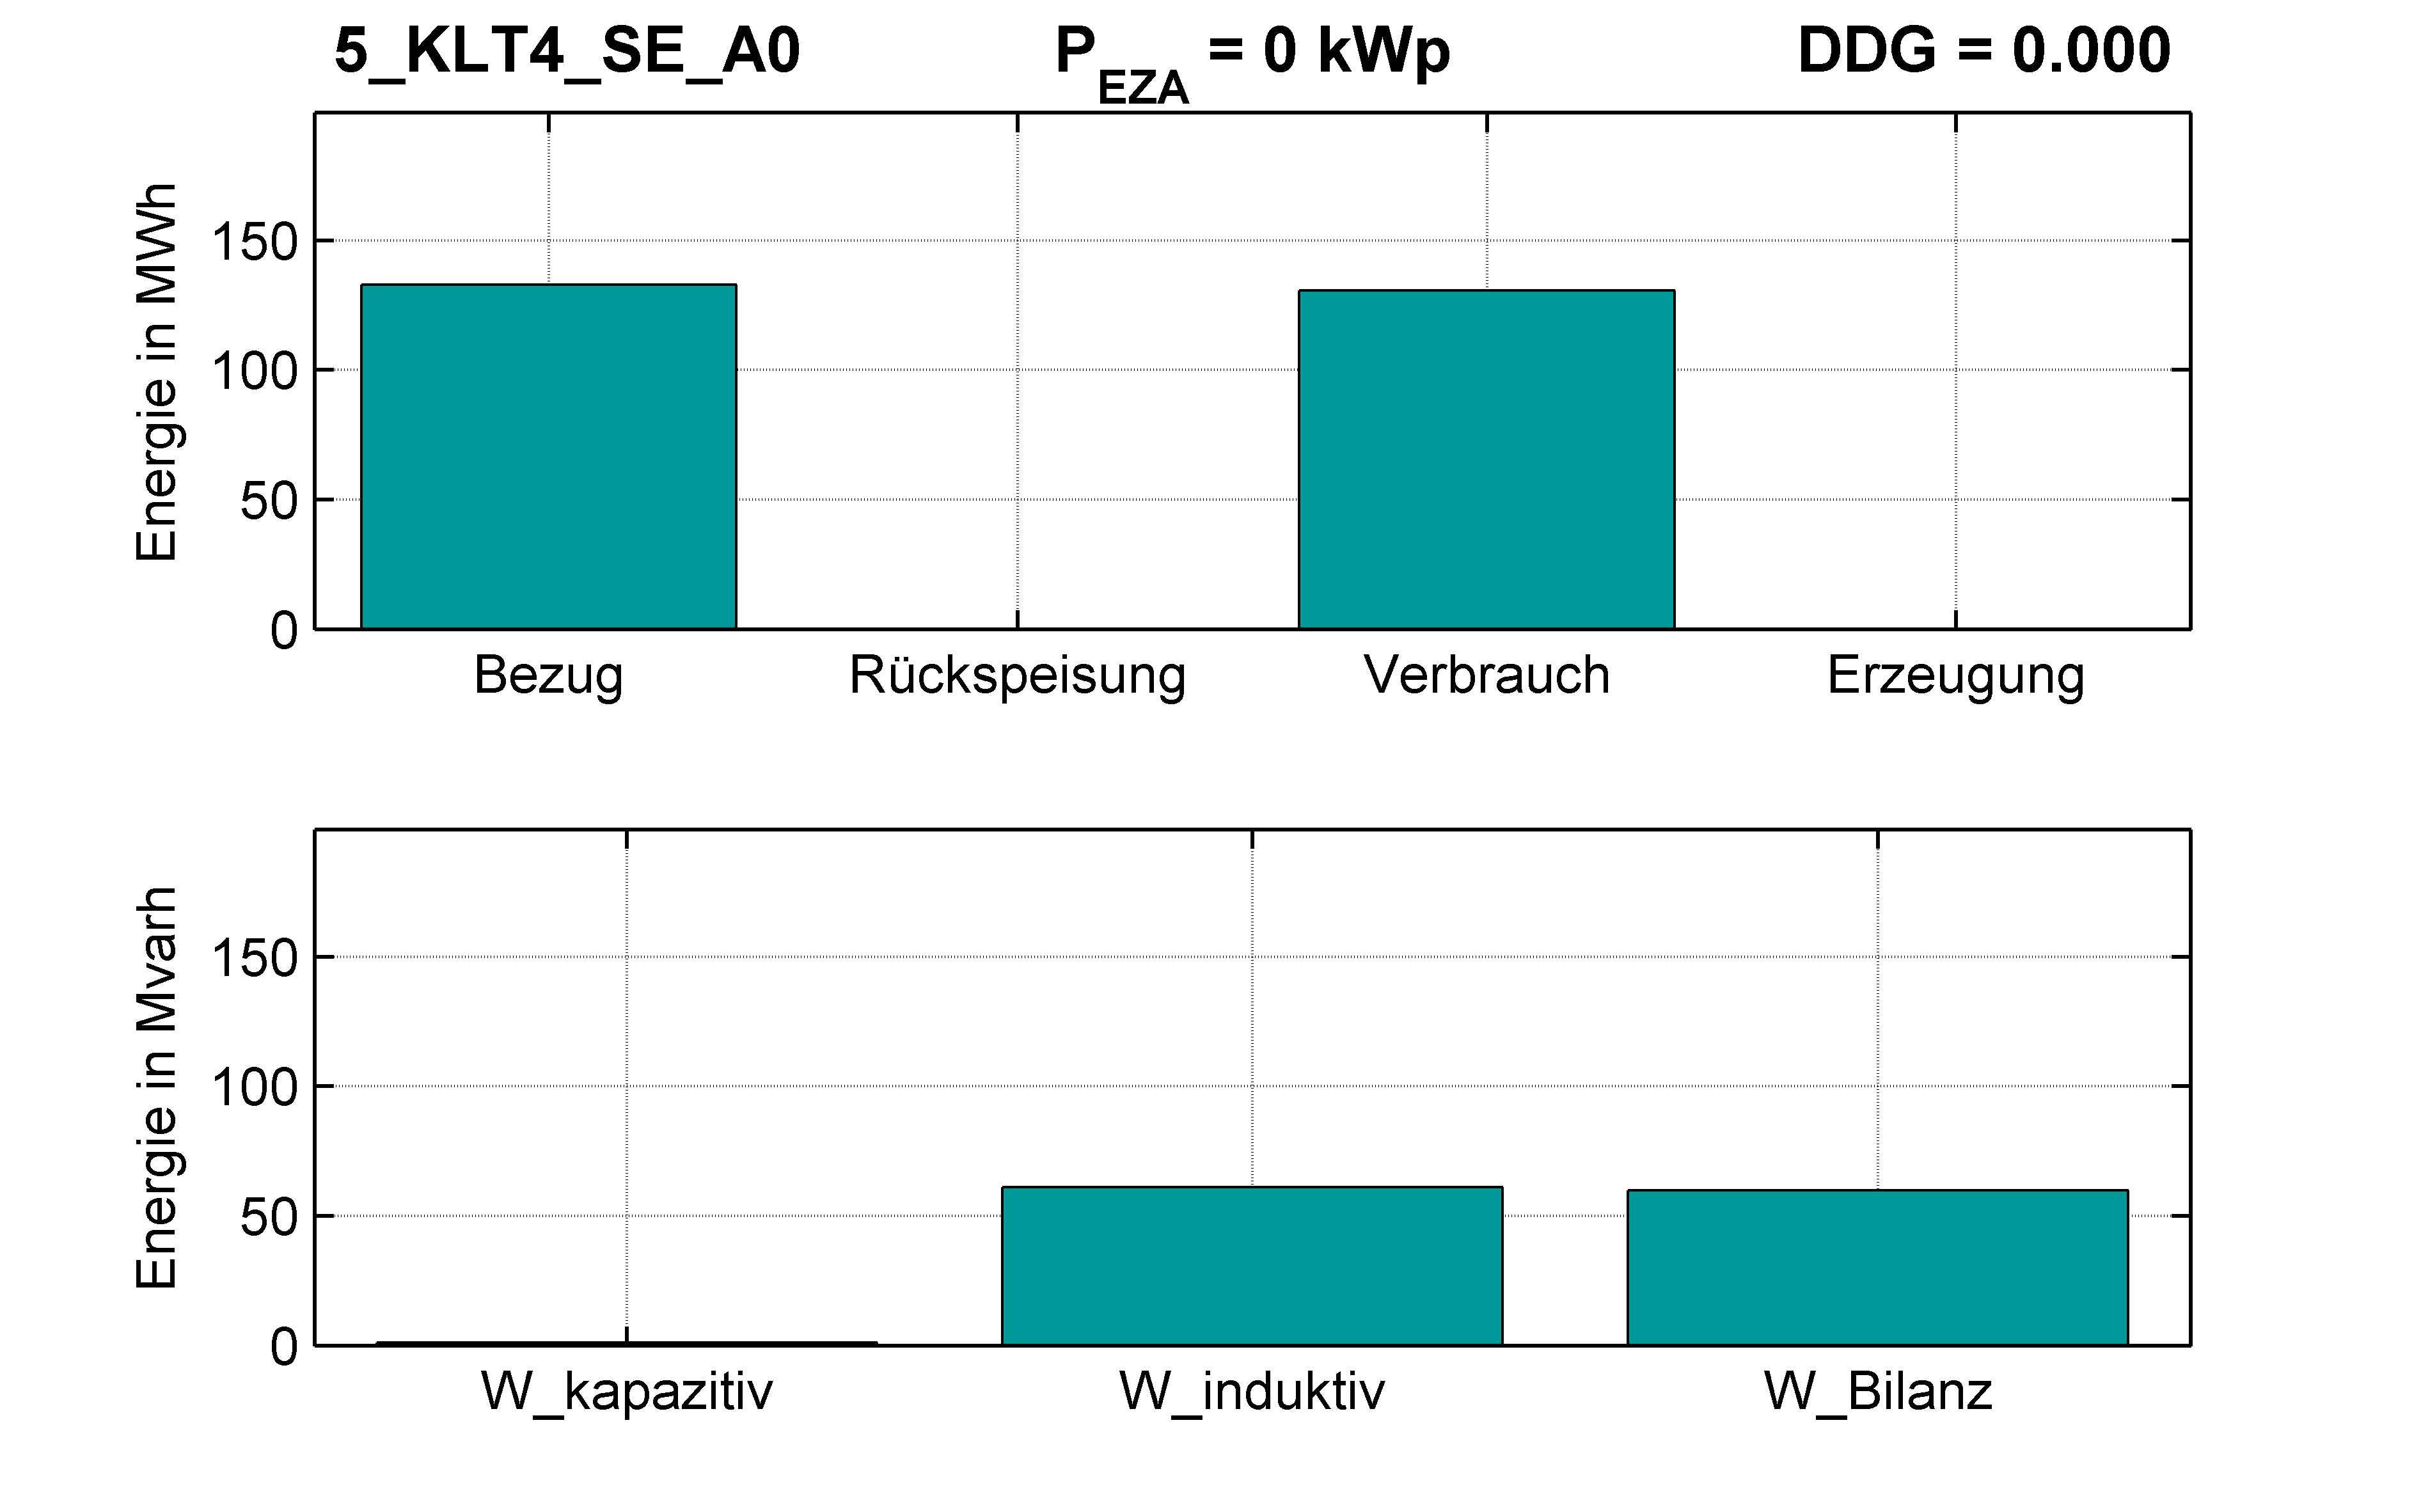 KLT4 | STATION (SE) A0 | PQ-Bilanz